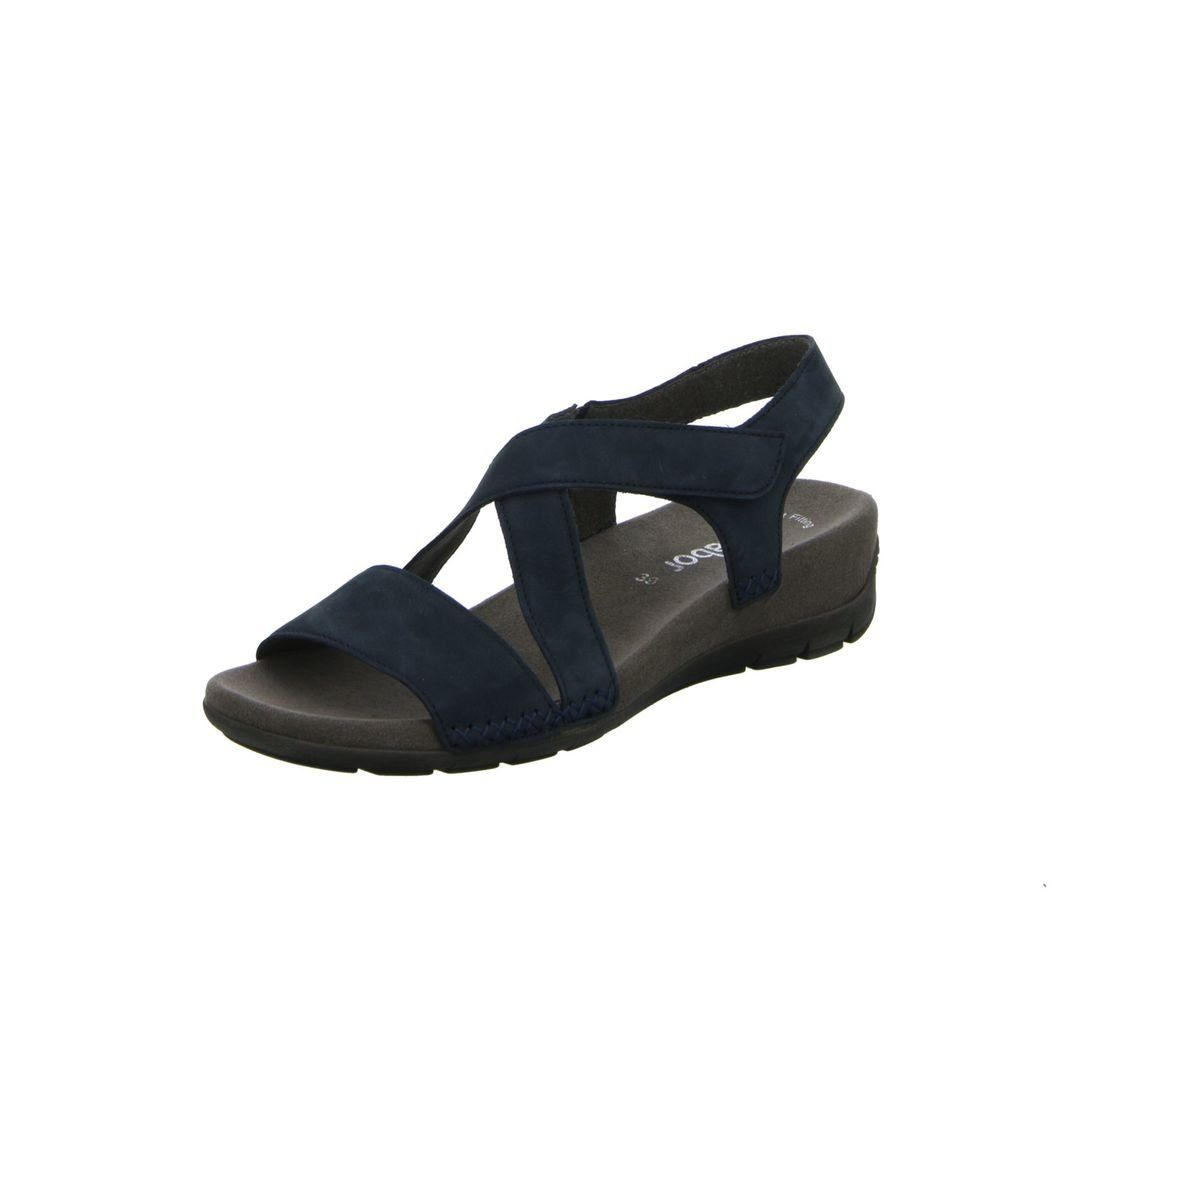 Mode >11015 Gabor Gabor >11015 Sandale b915d1